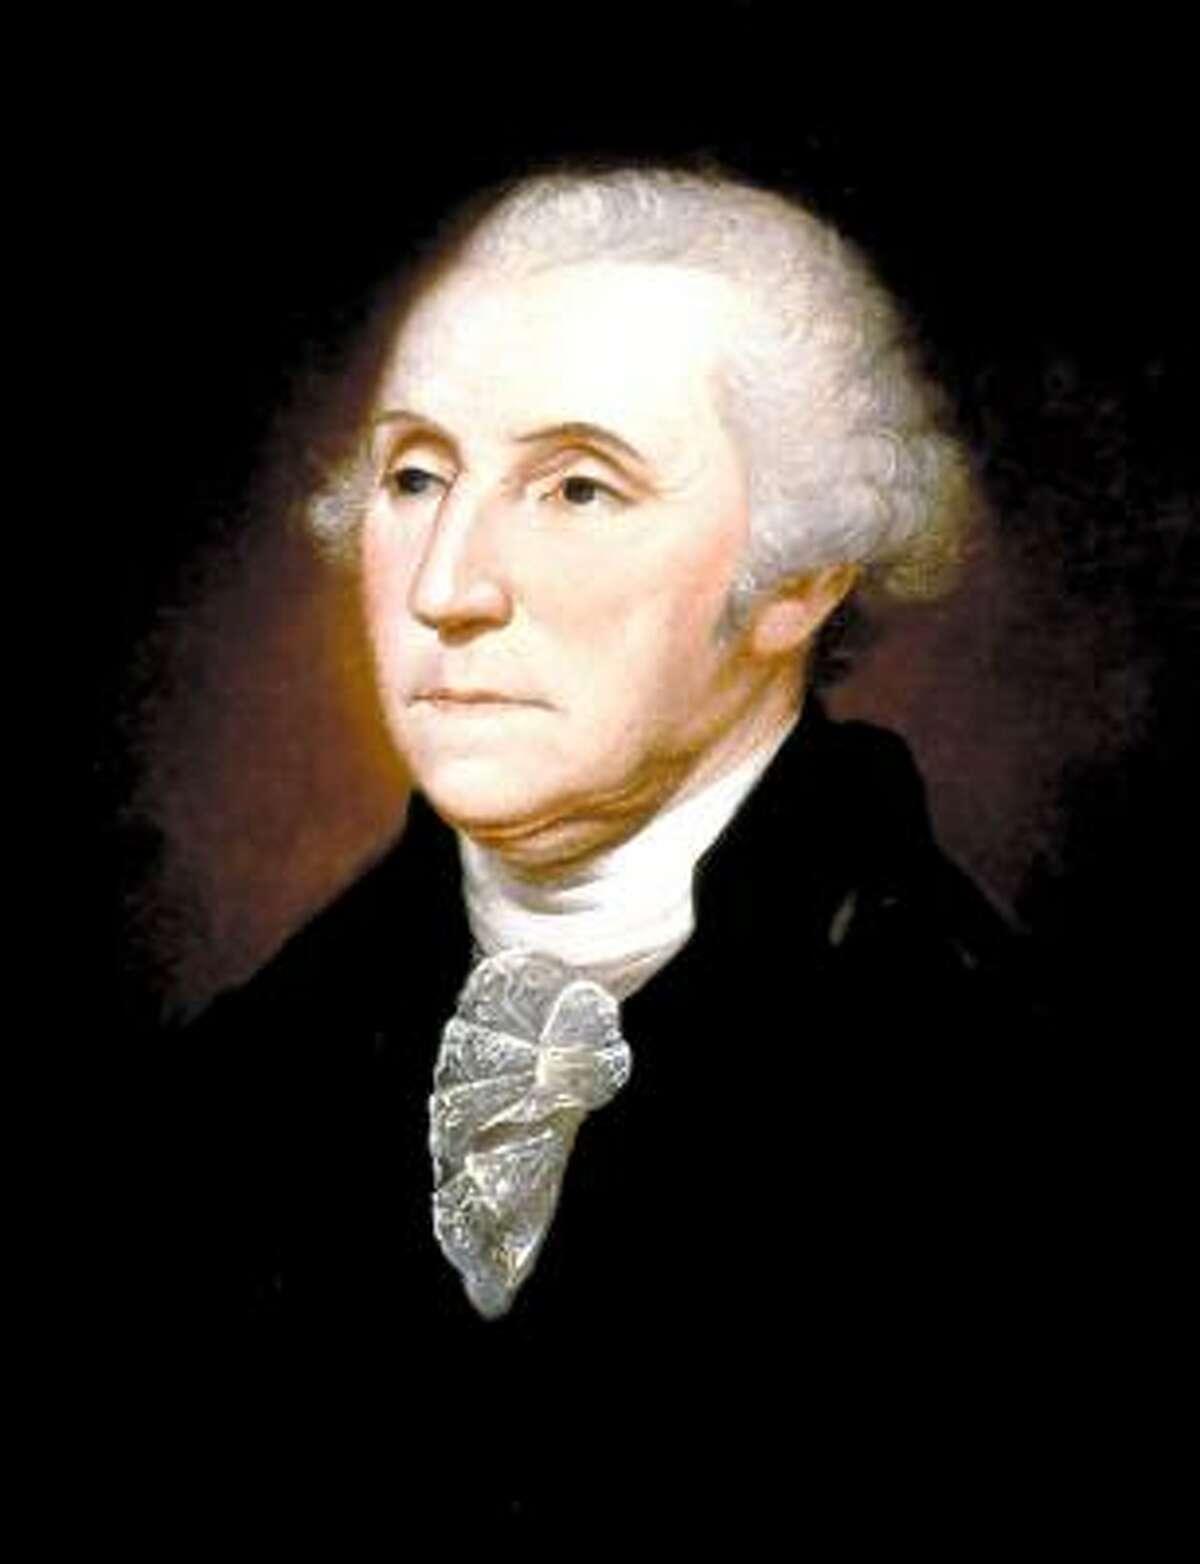 2. George Washington , president from 1789-1797